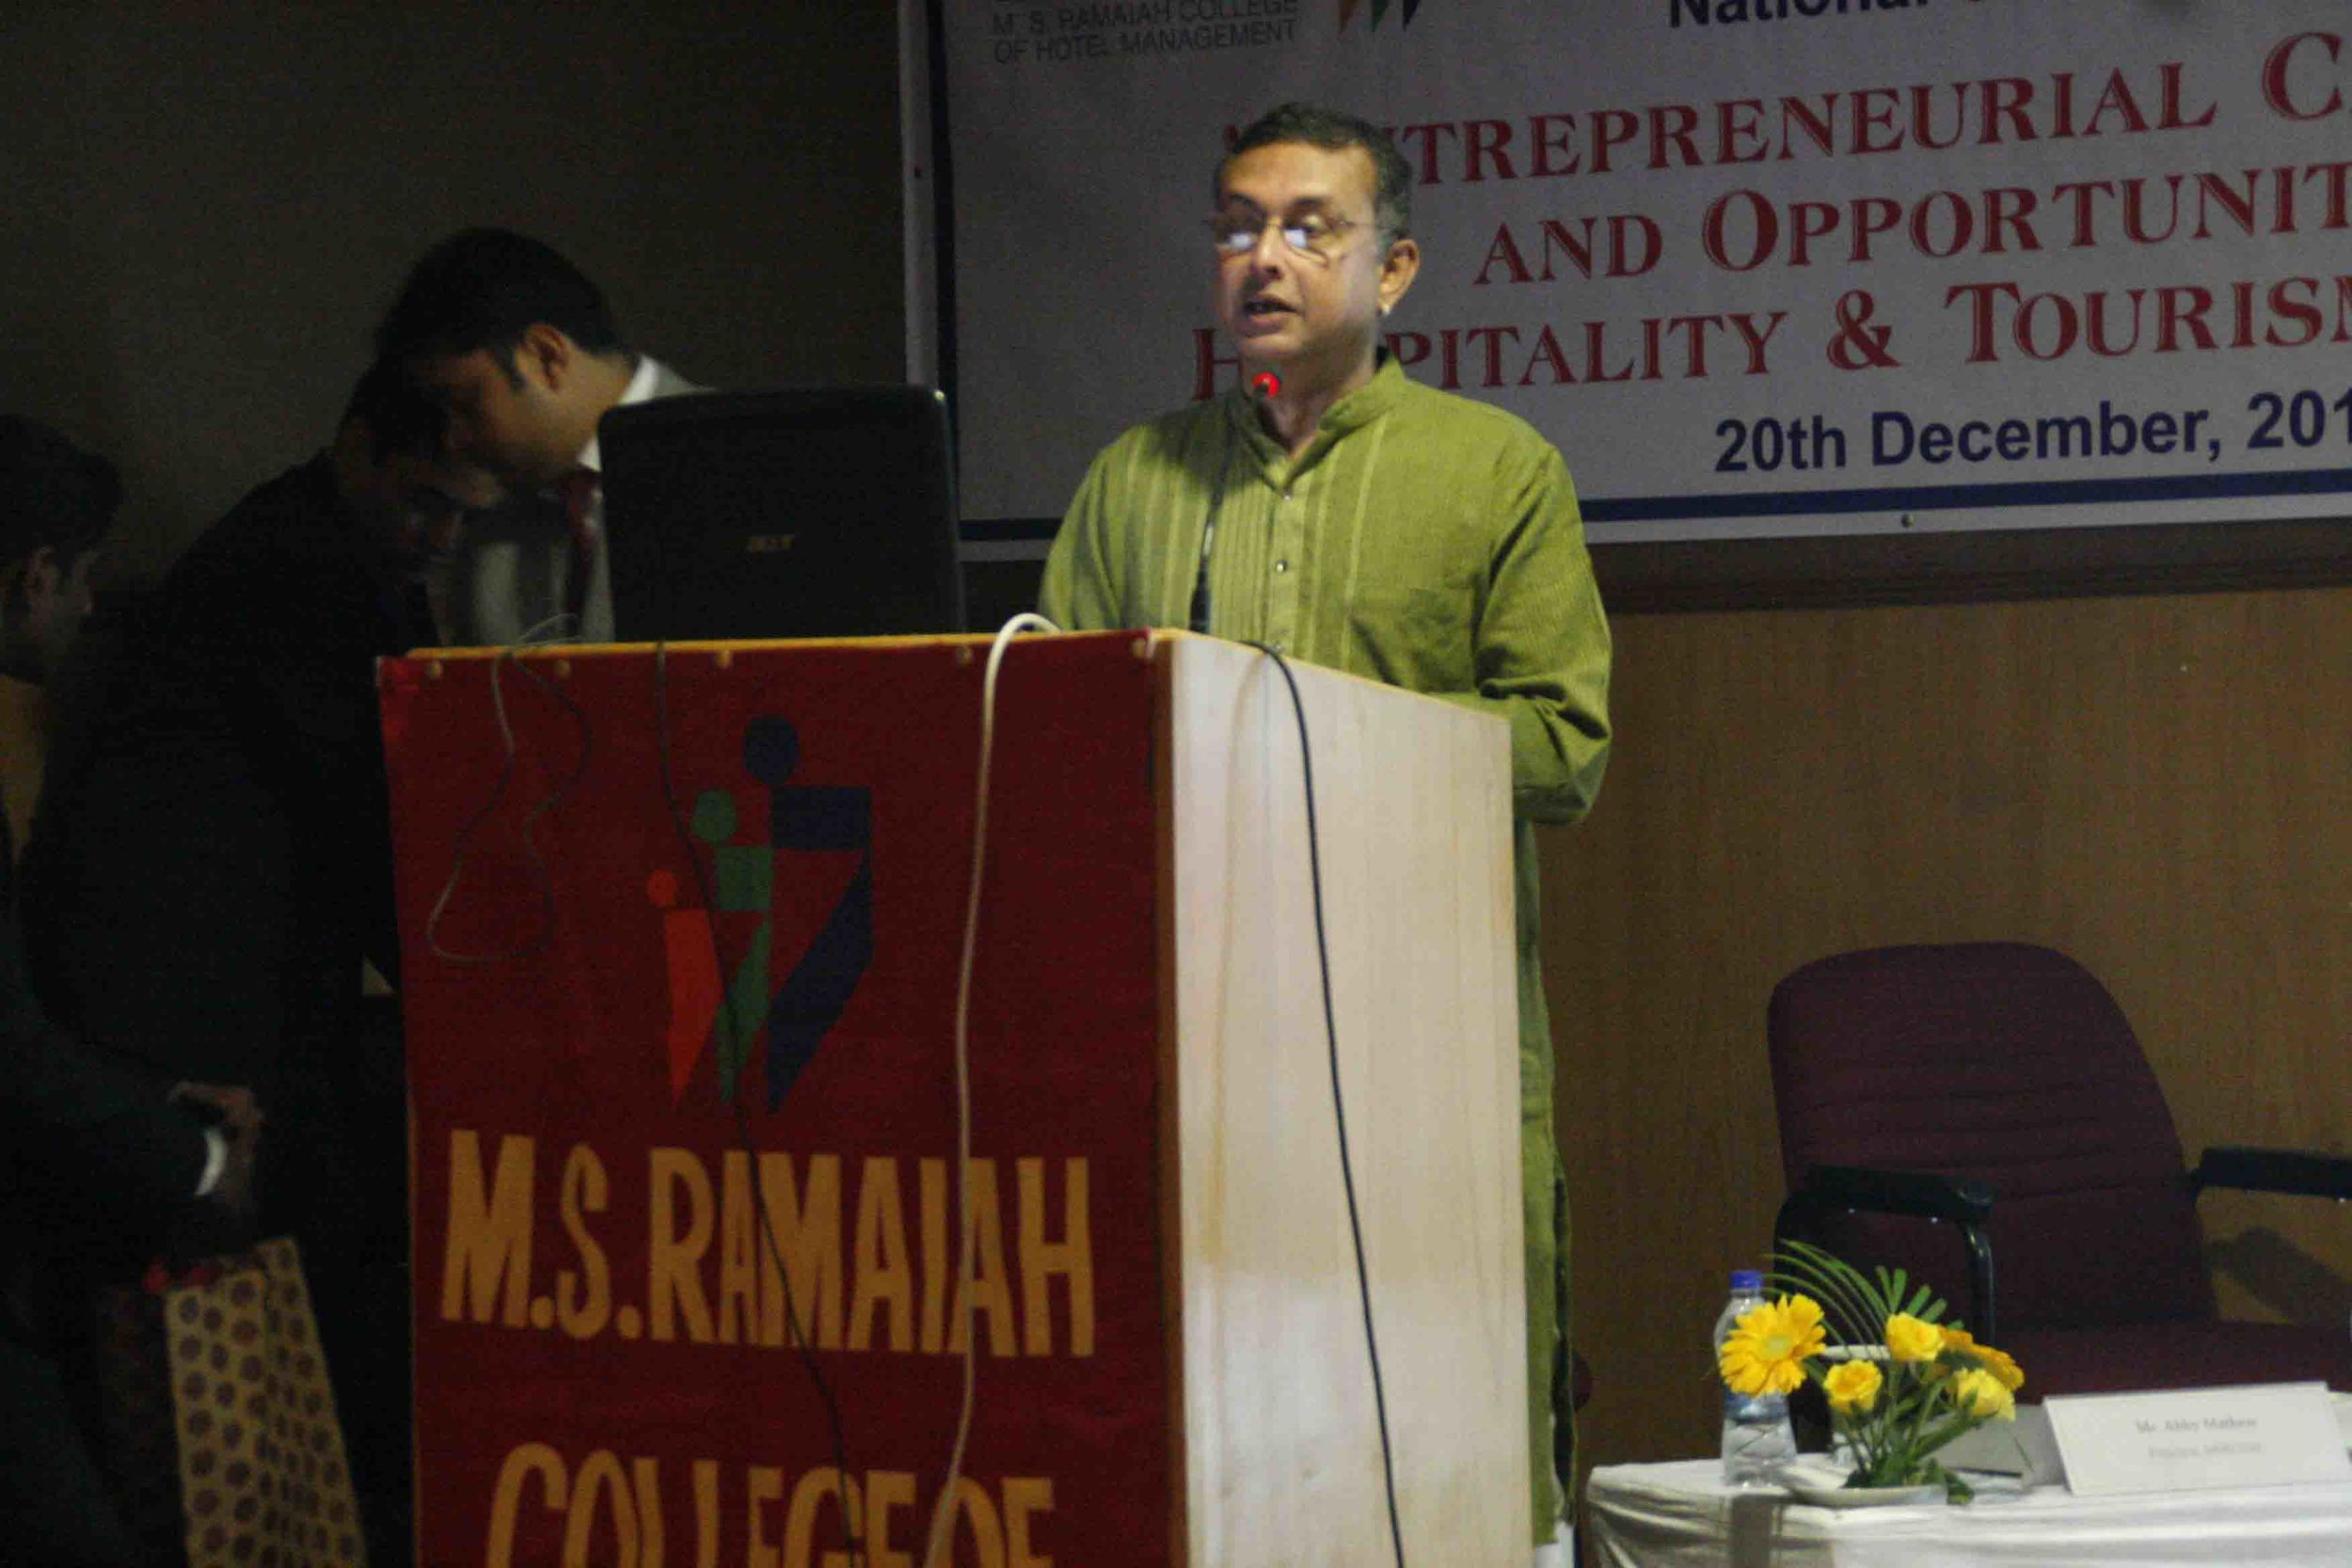 national tourism conference at ramaya college, bangalore, 2014